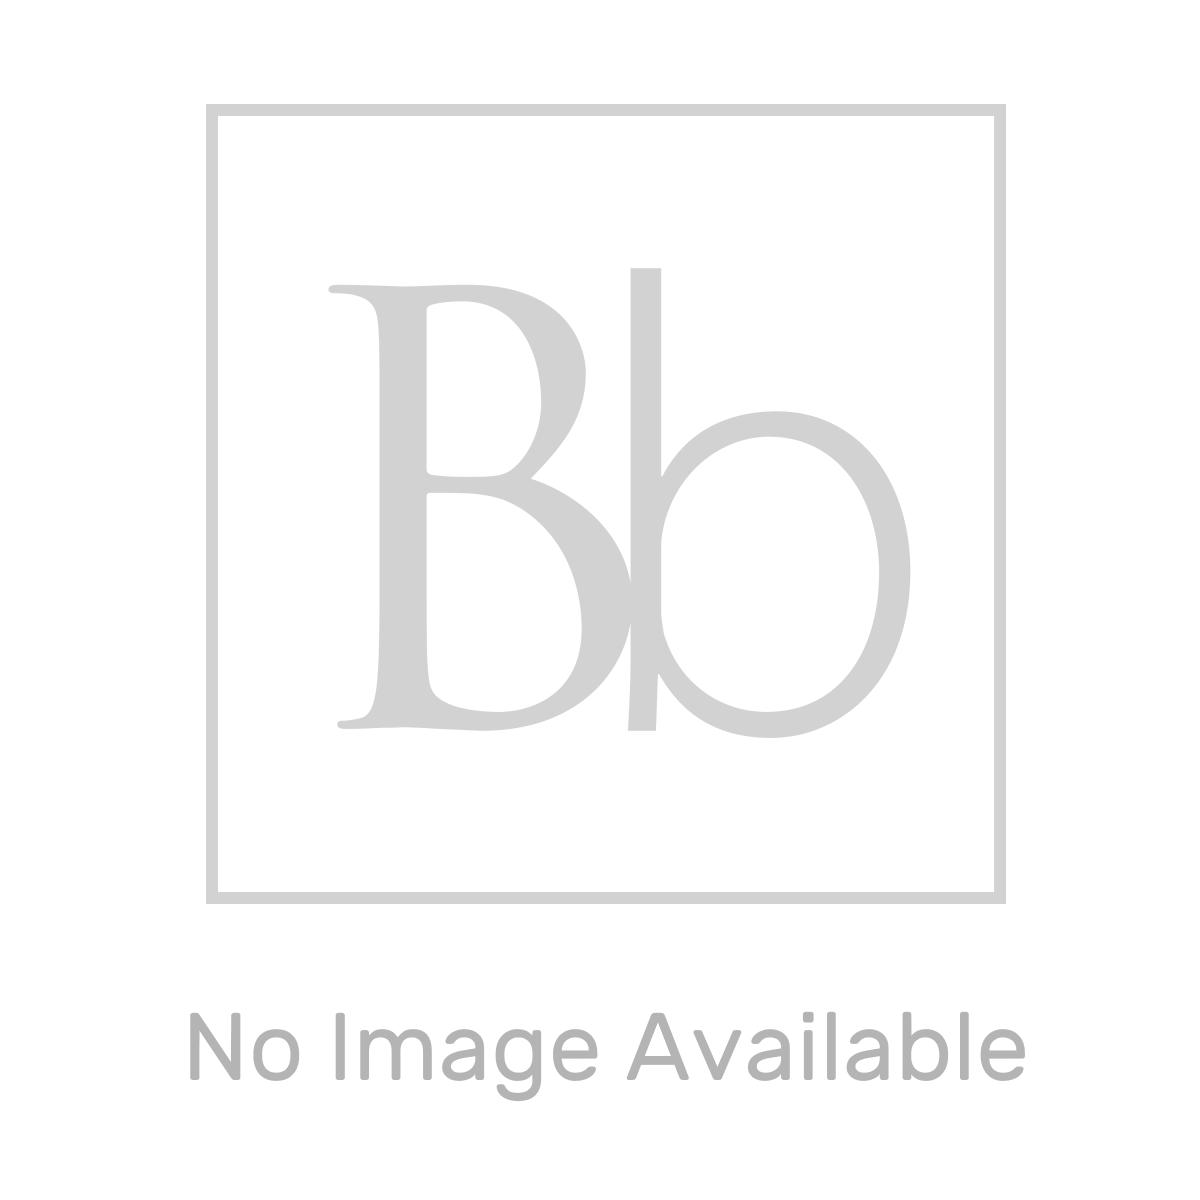 RAK Washington Grey Vanity Unit with Black Countertop 1200mm Measurements